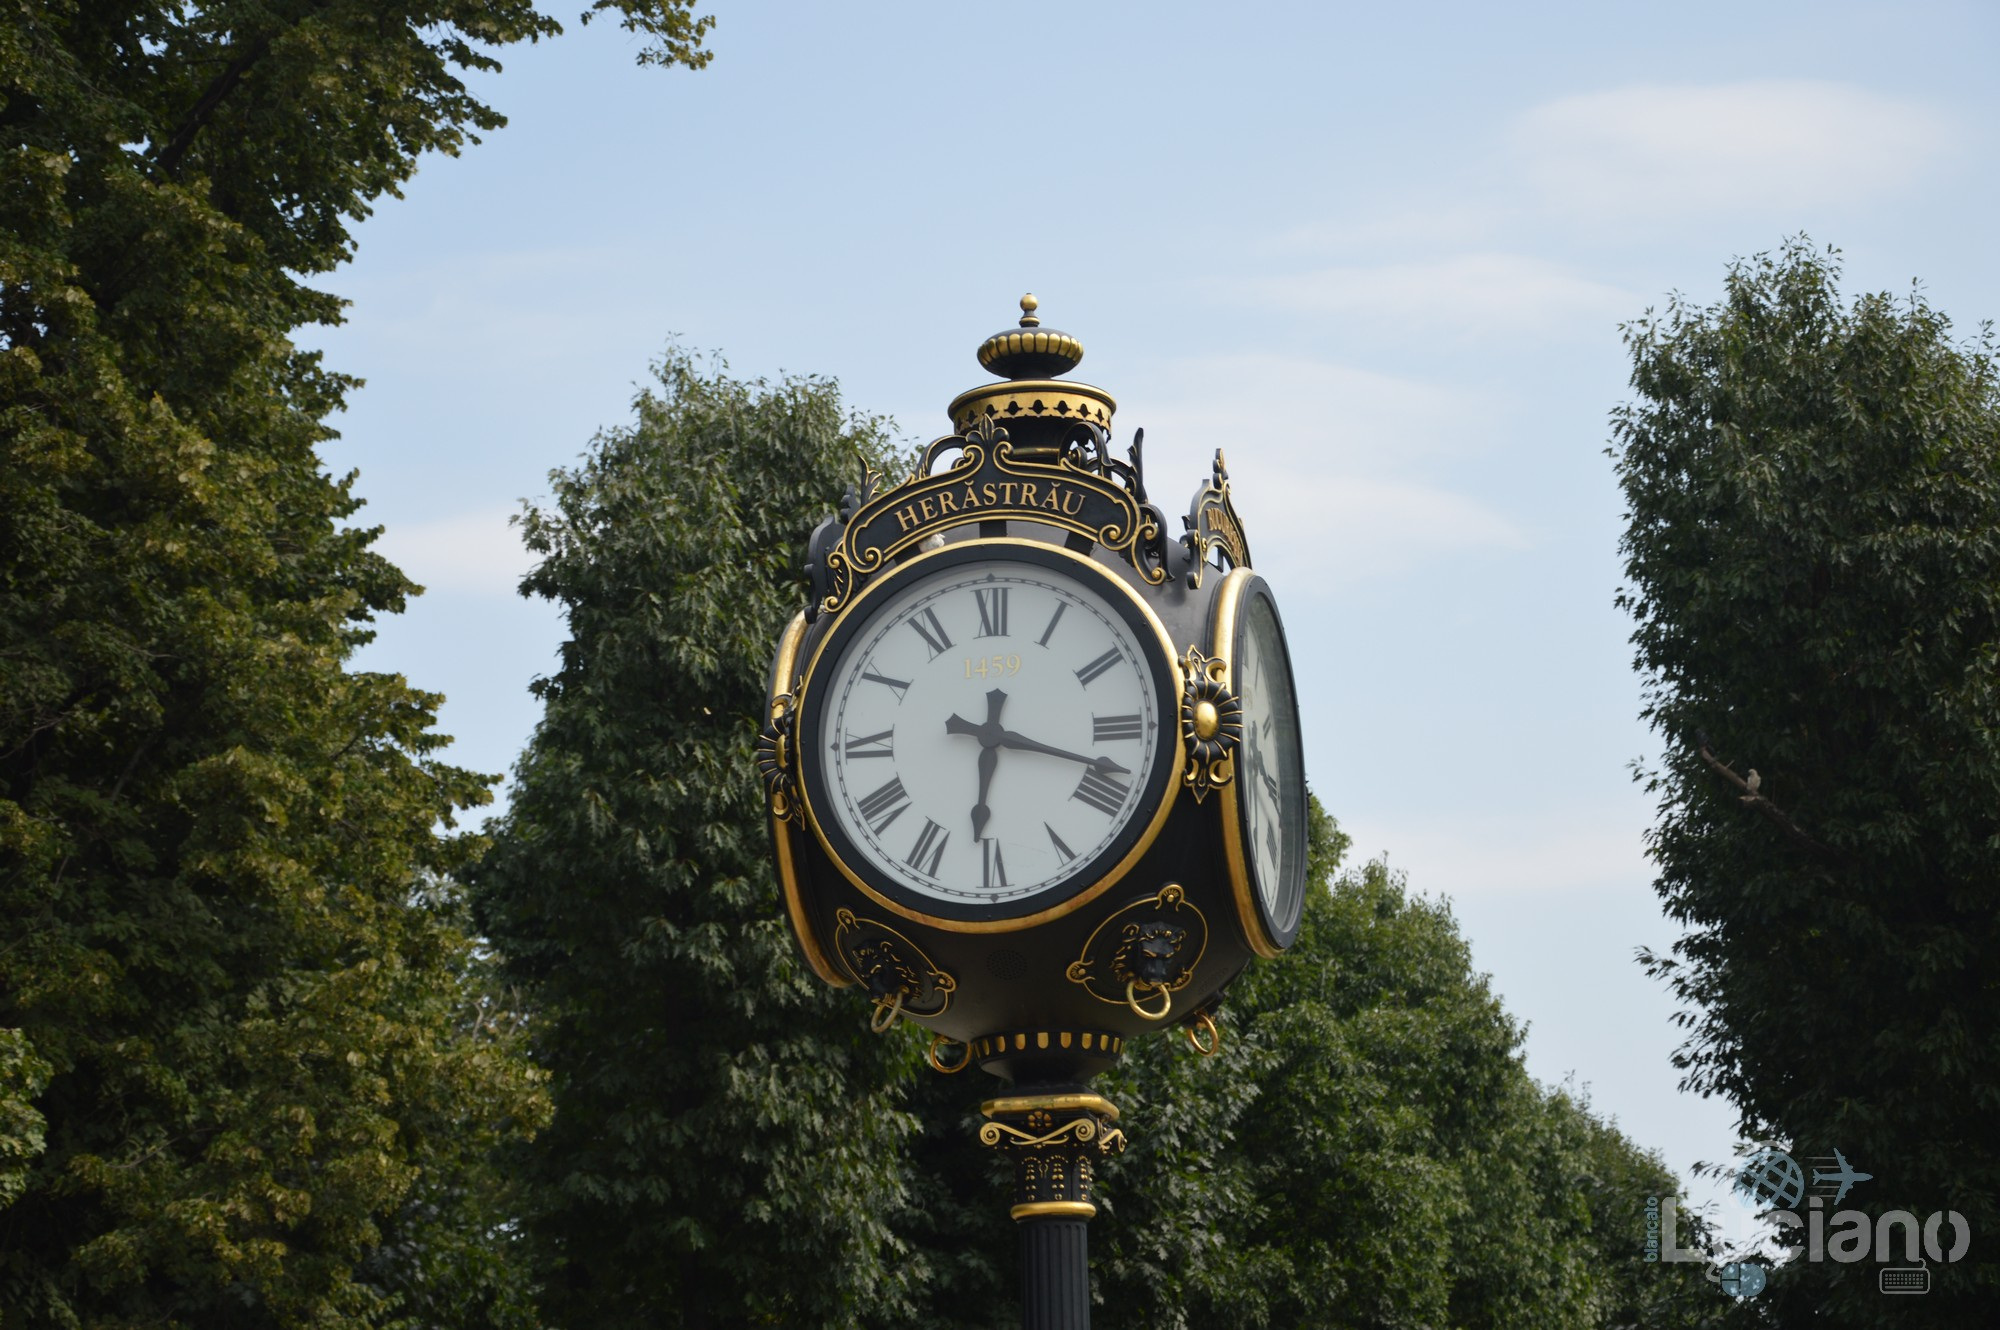 orologio - King Michael I Park - Parcul Regele Mihai I al României